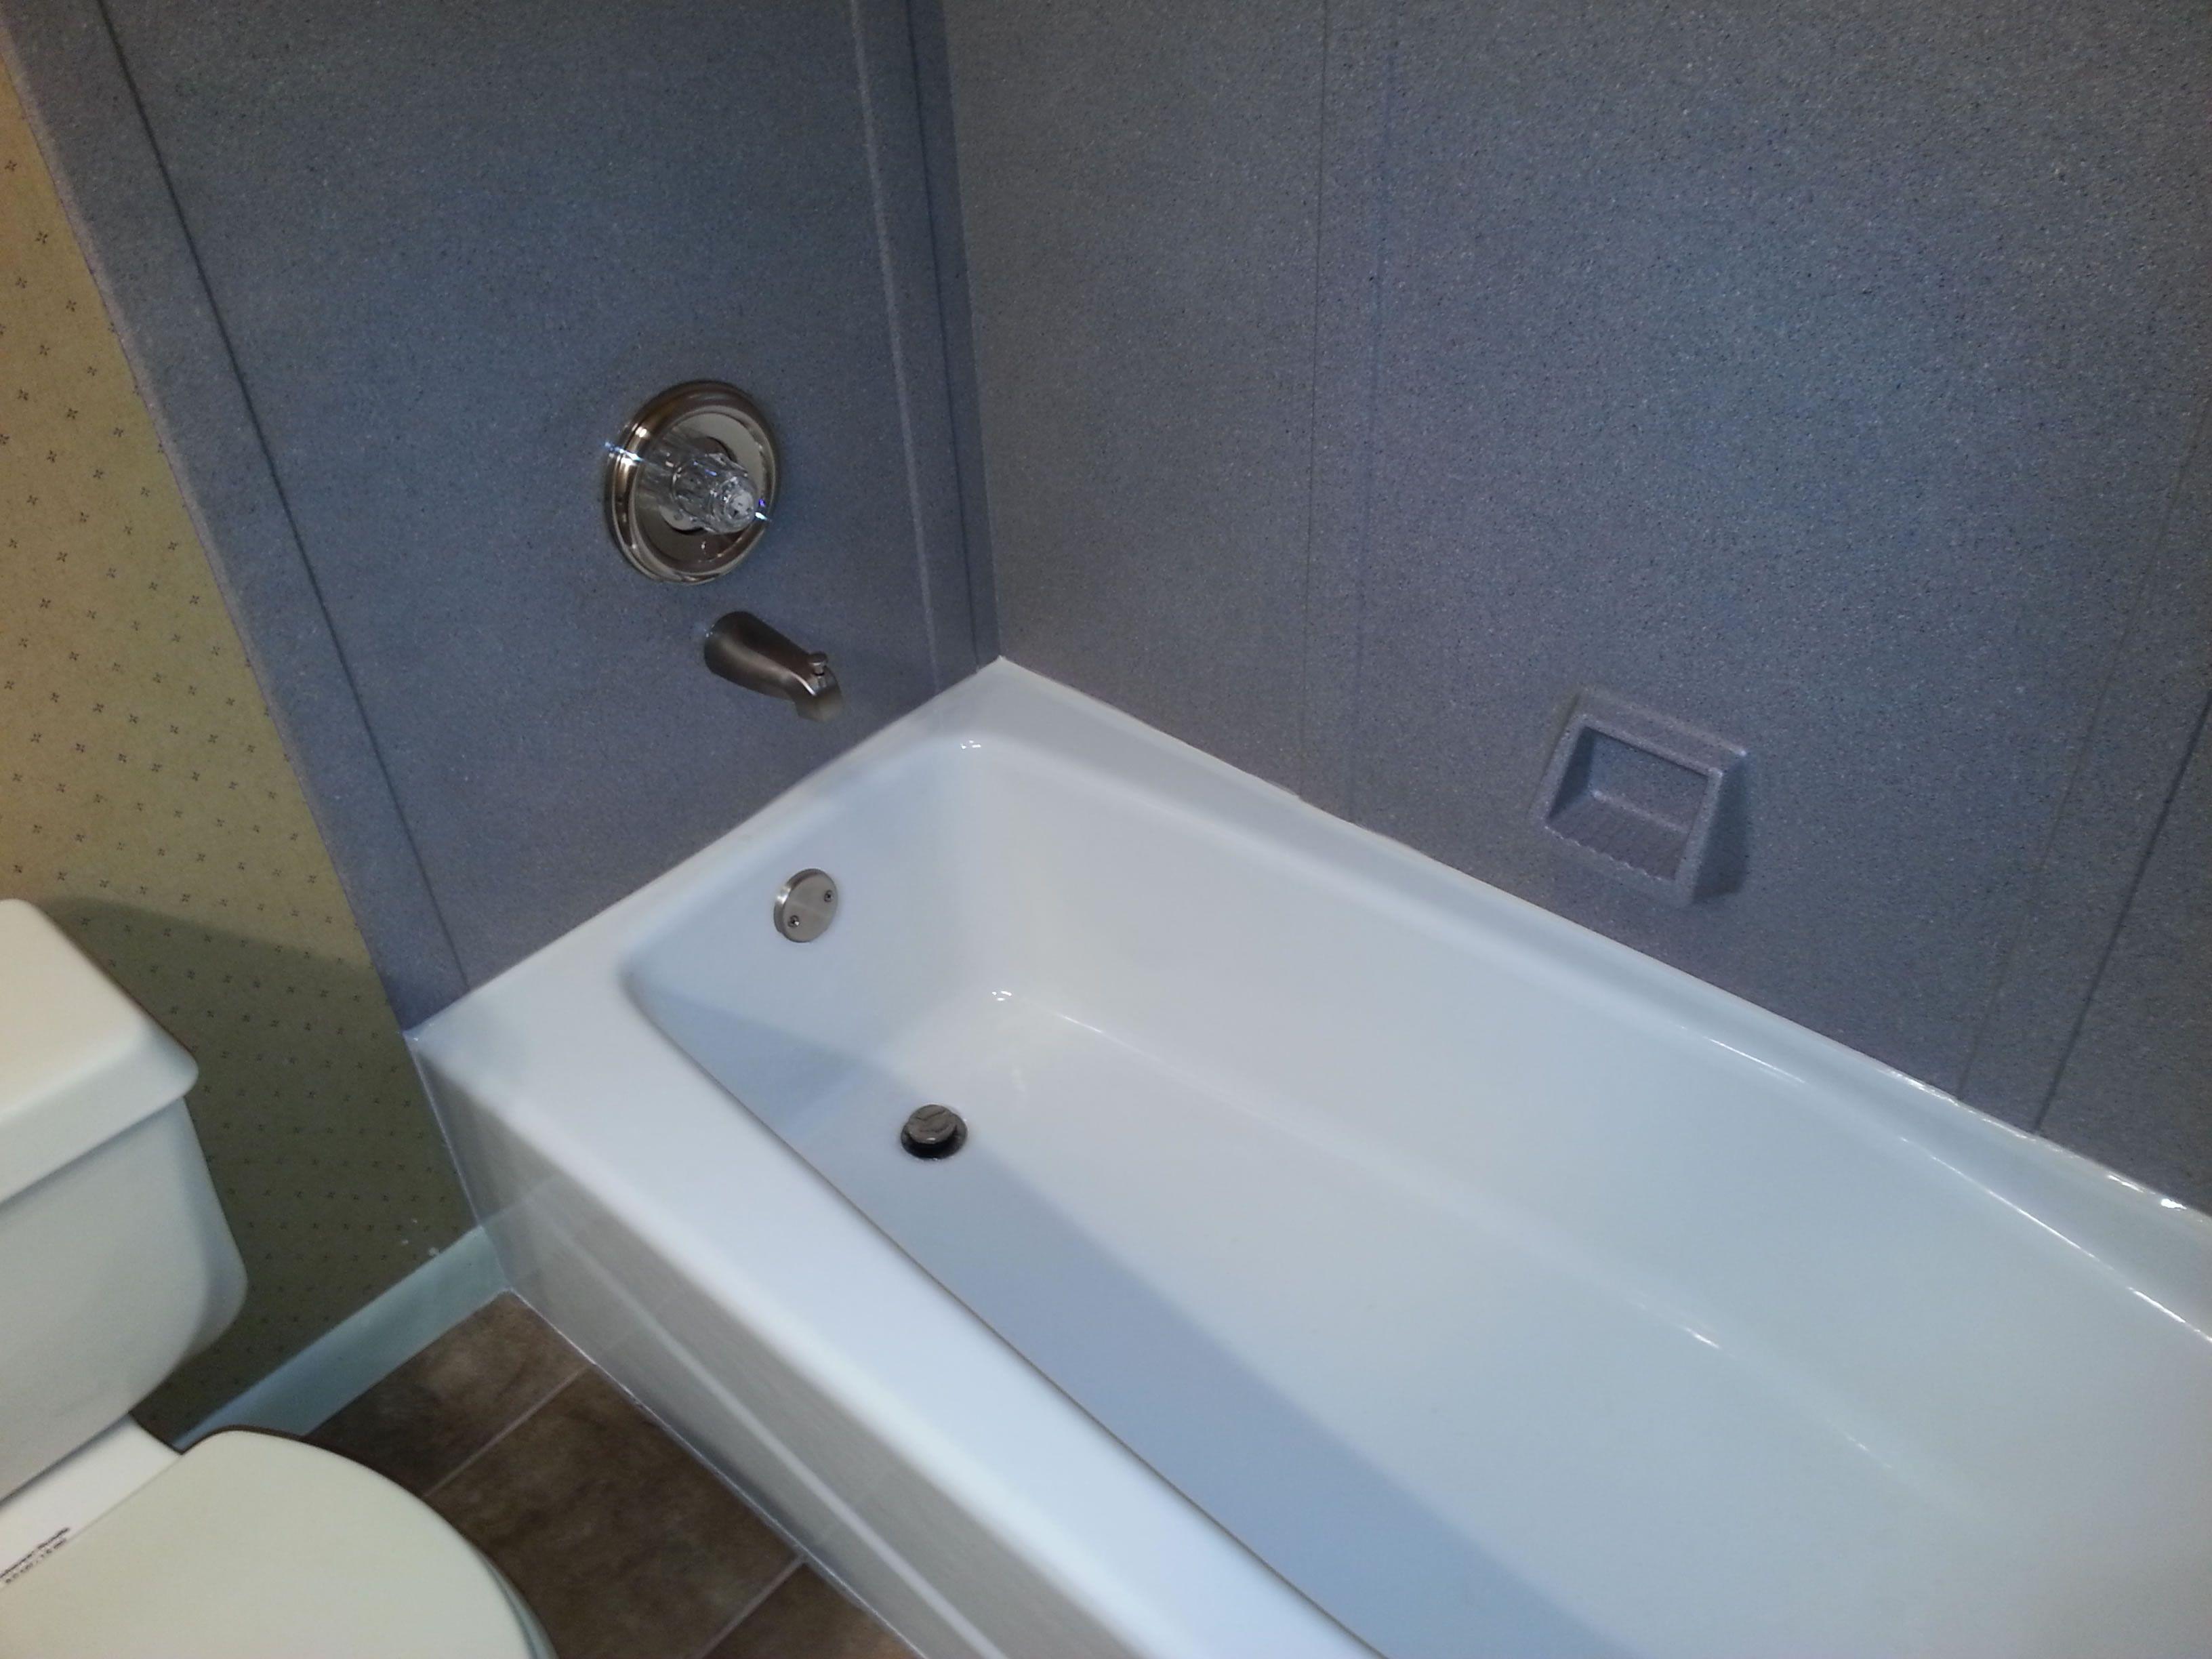 Best Bathtub Refinishing Owner operator certified licensed 623 792 ...